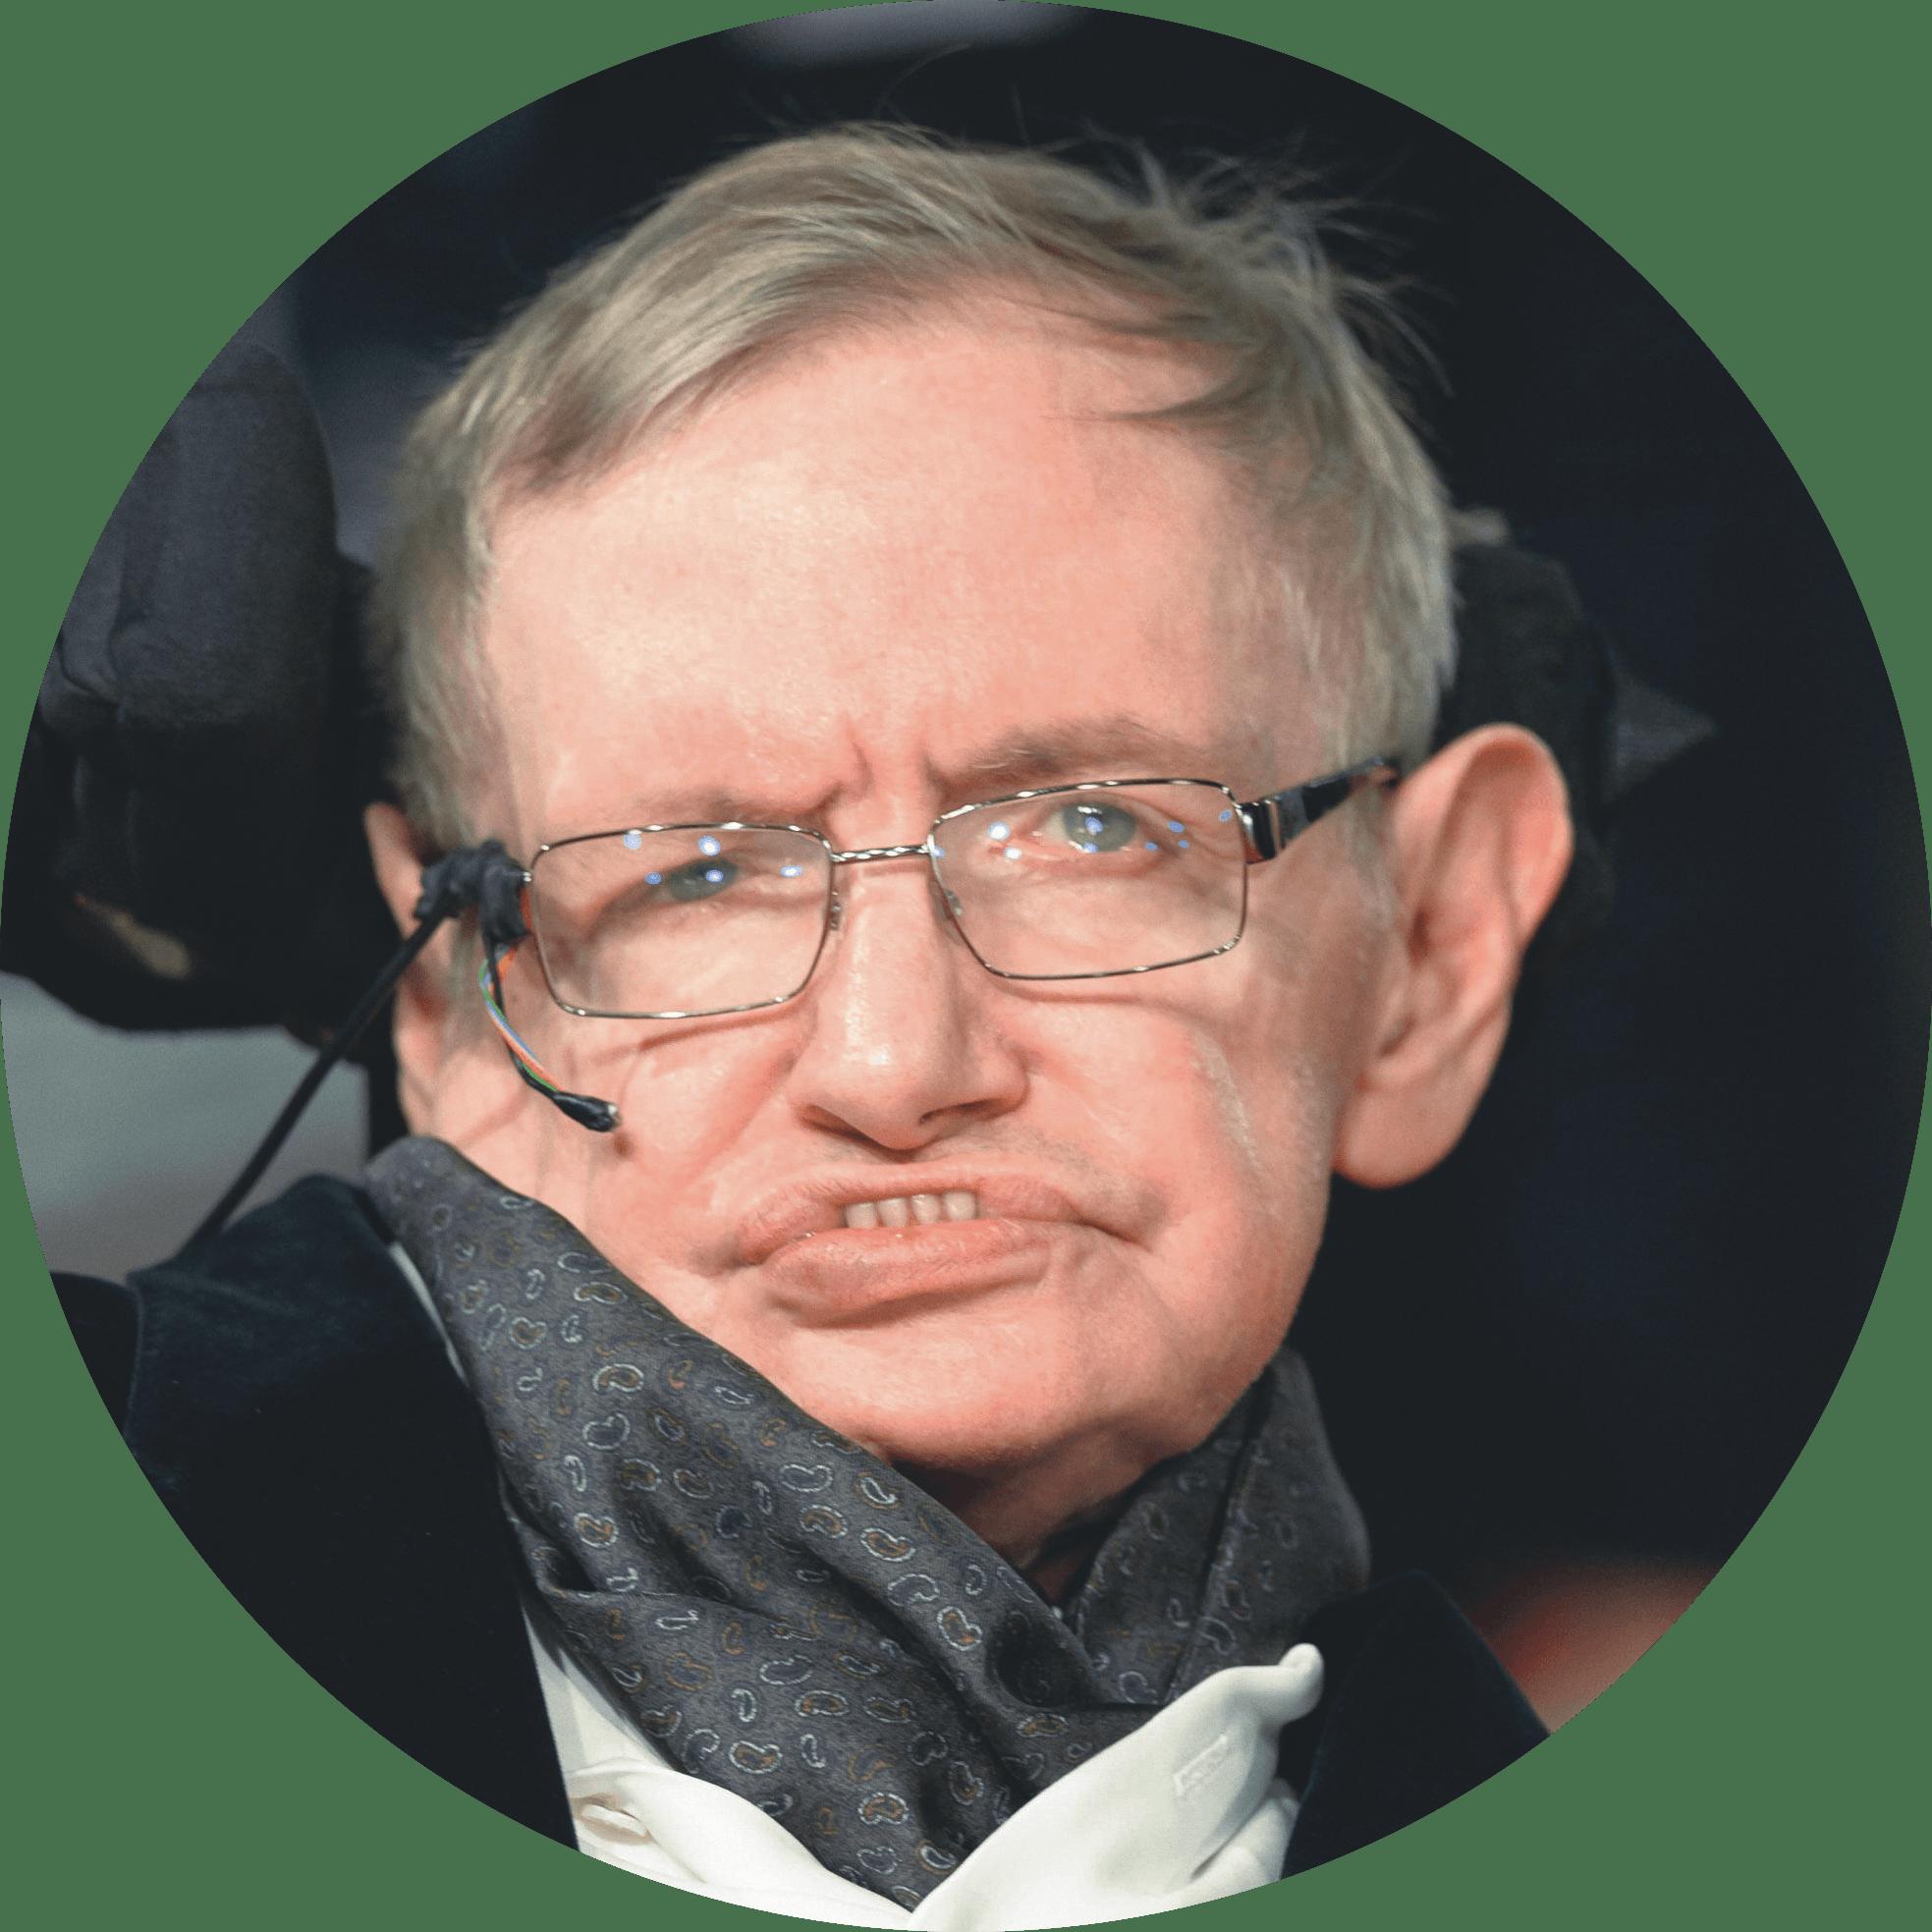 Portrait Stephen Hawking